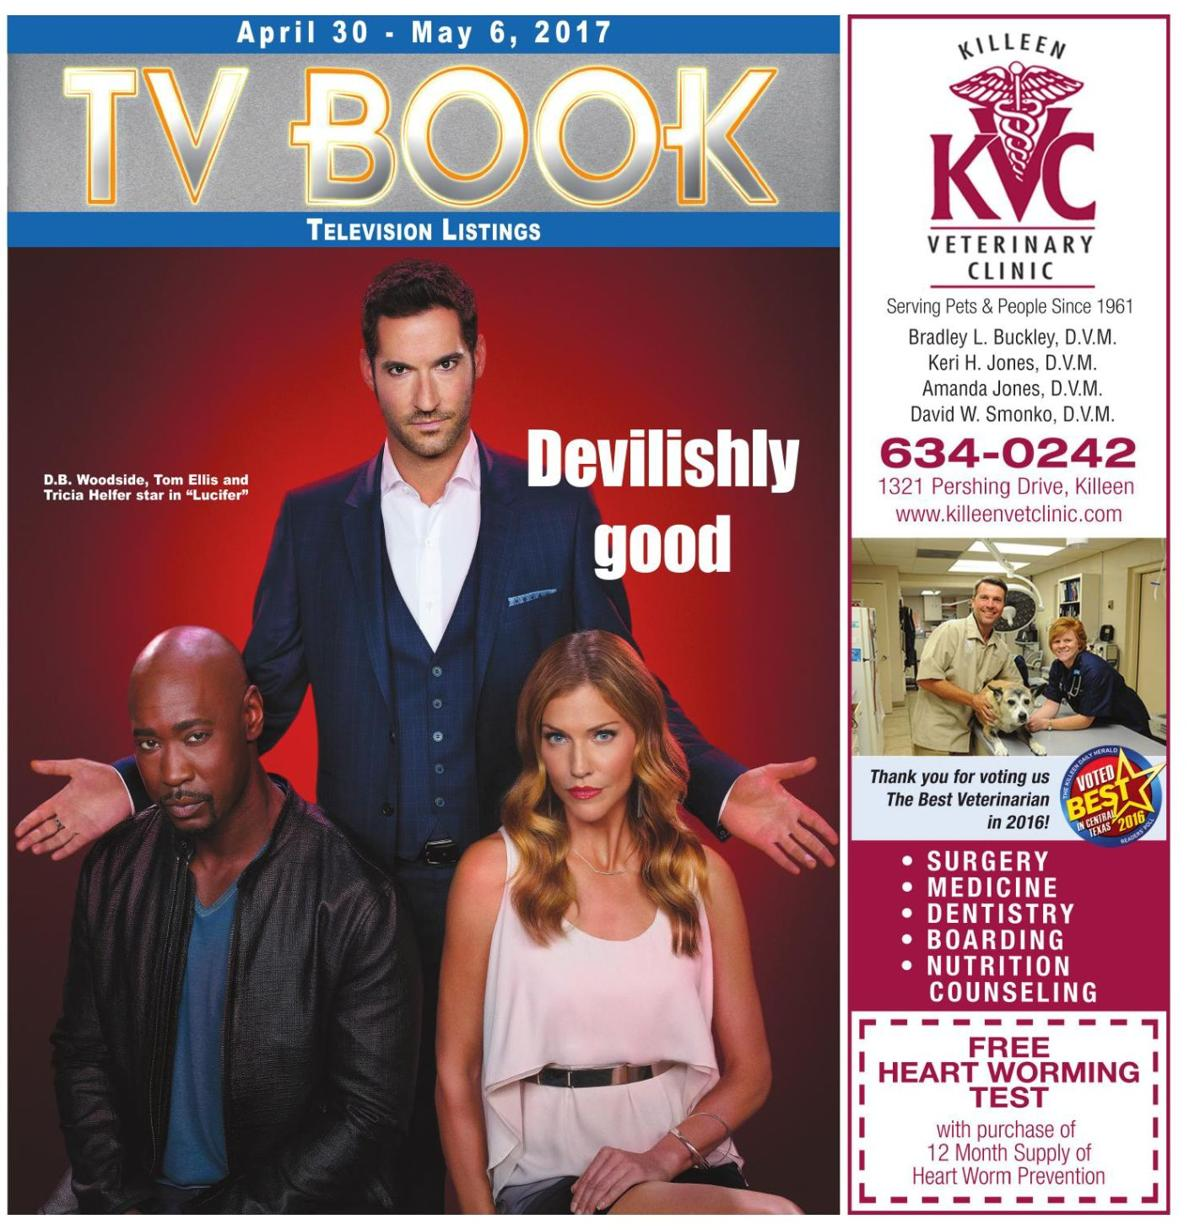 TV Book April 30th - May 6th